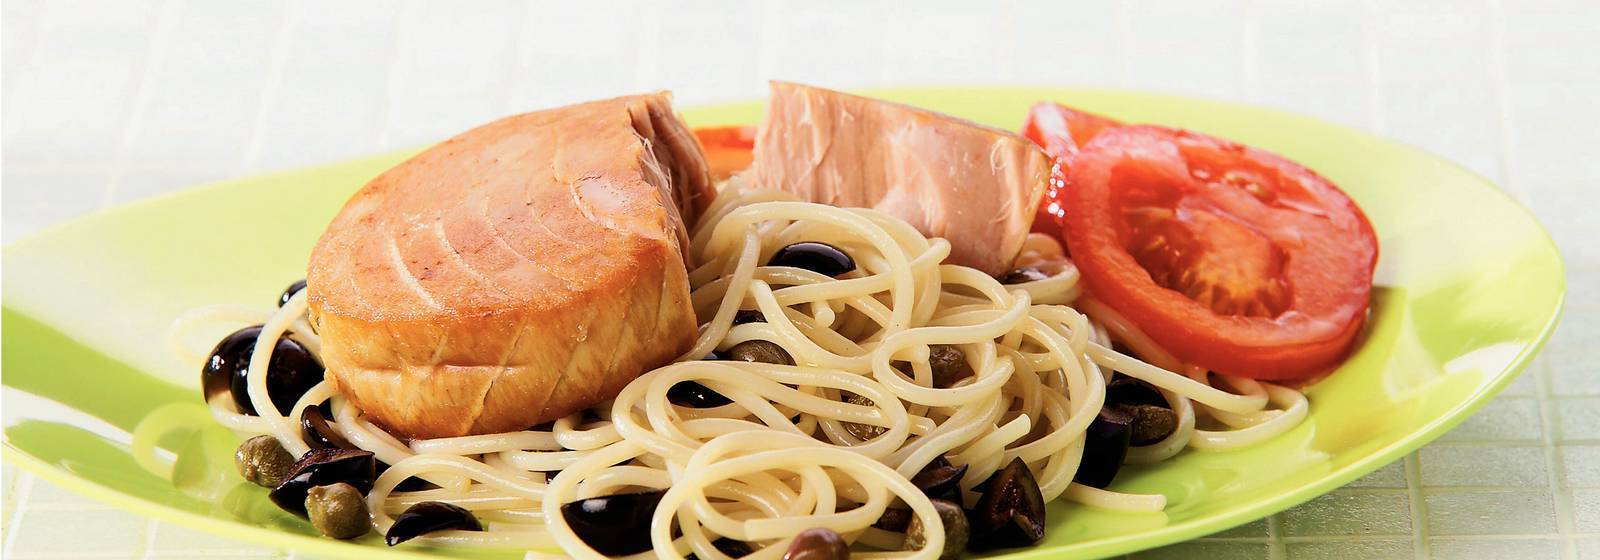 Spaghetti with tuna steak